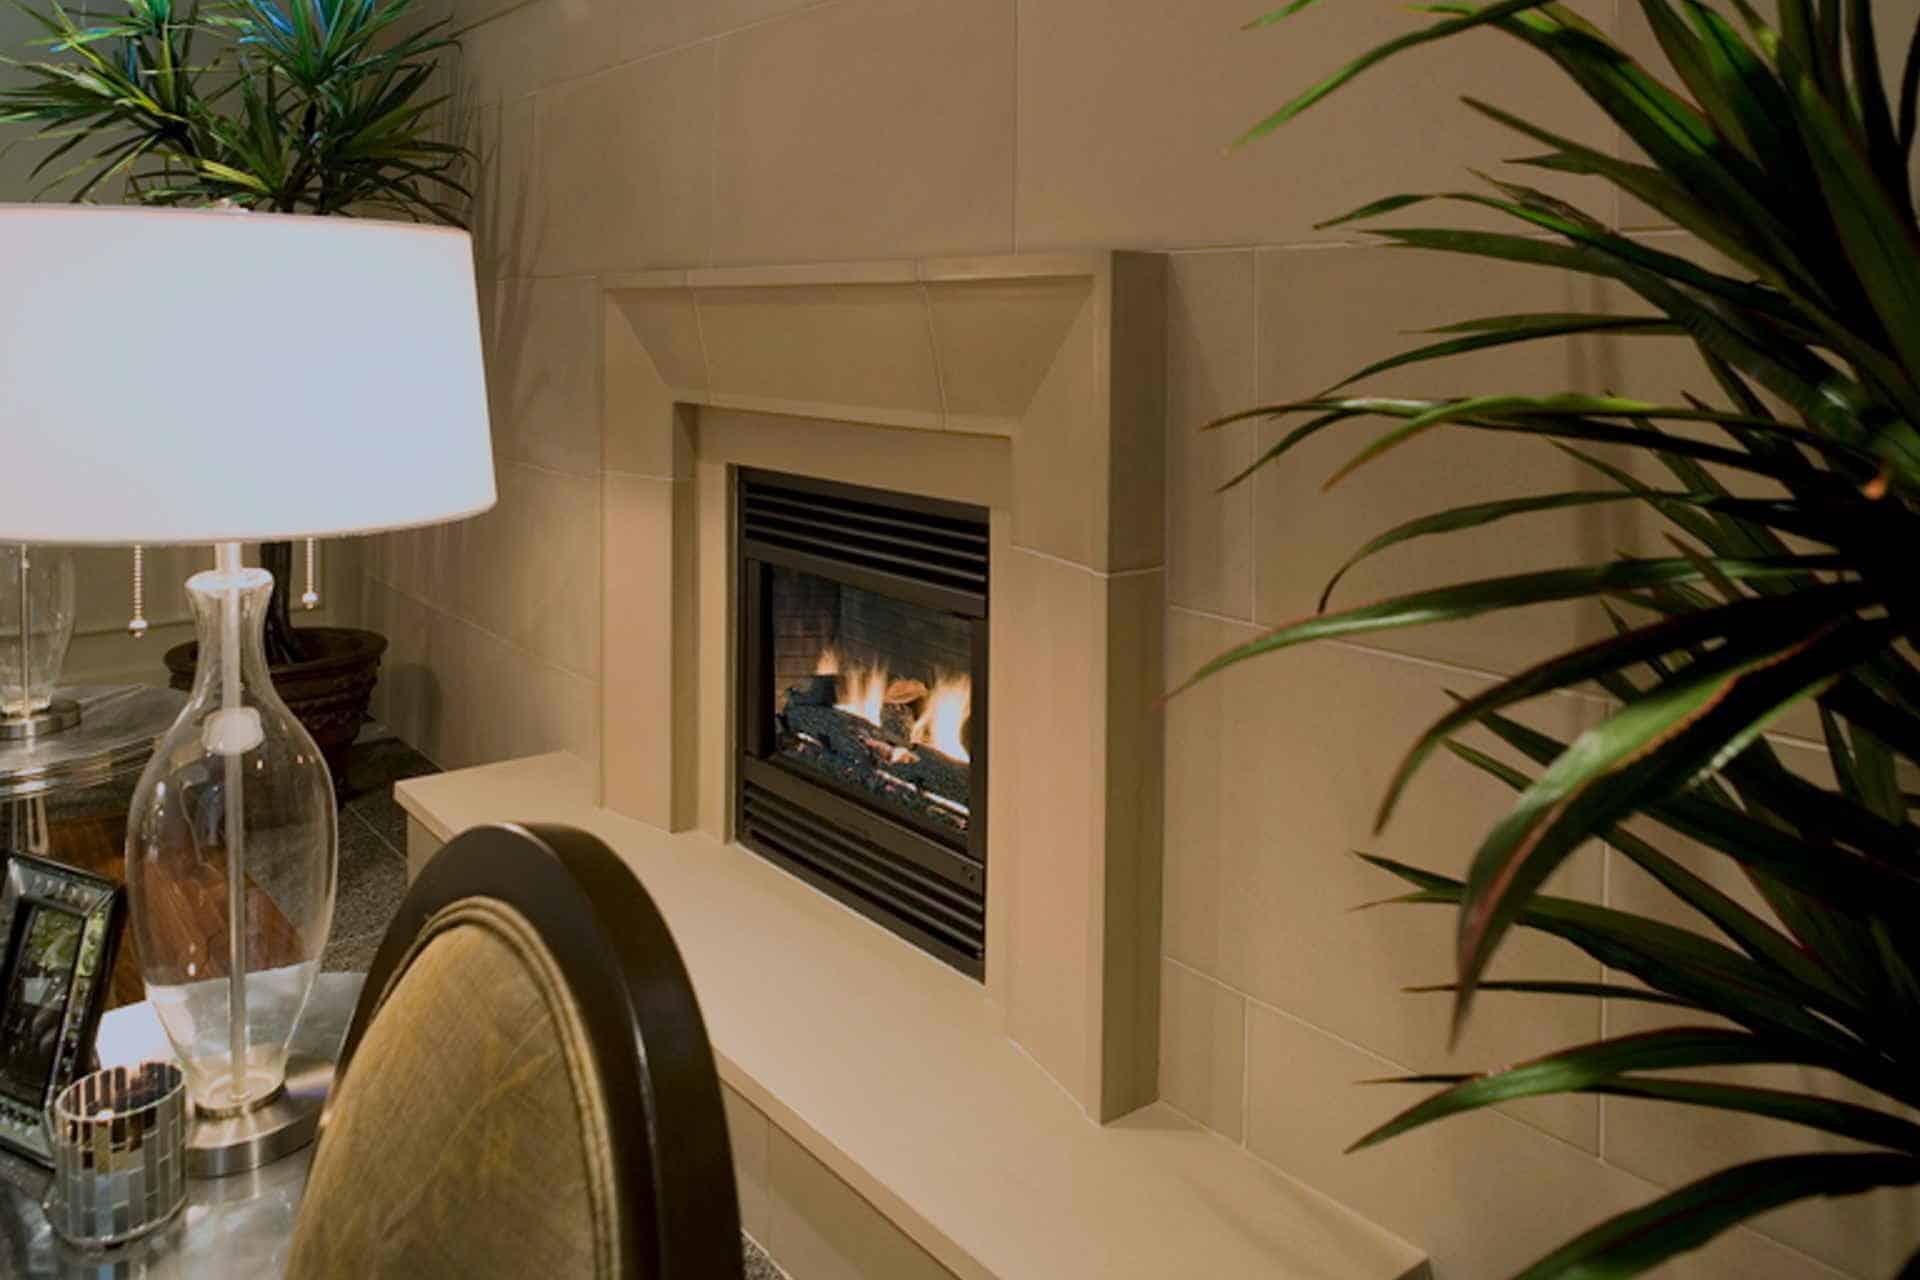 Solus Taper concrete fireplace surround